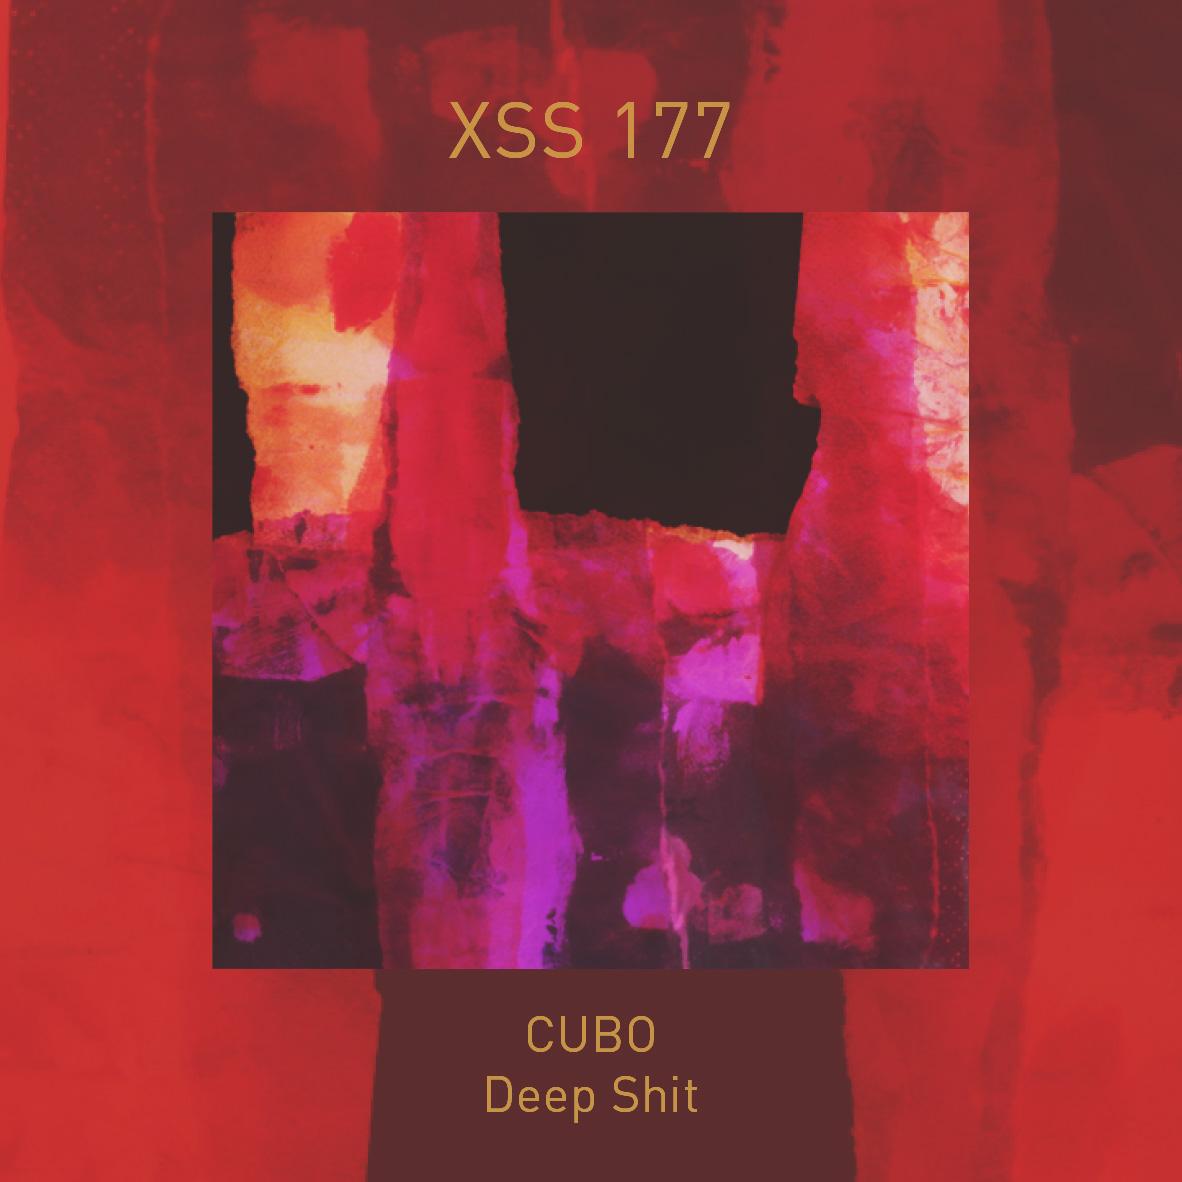 XSS177 | Cubo | Deep Shit